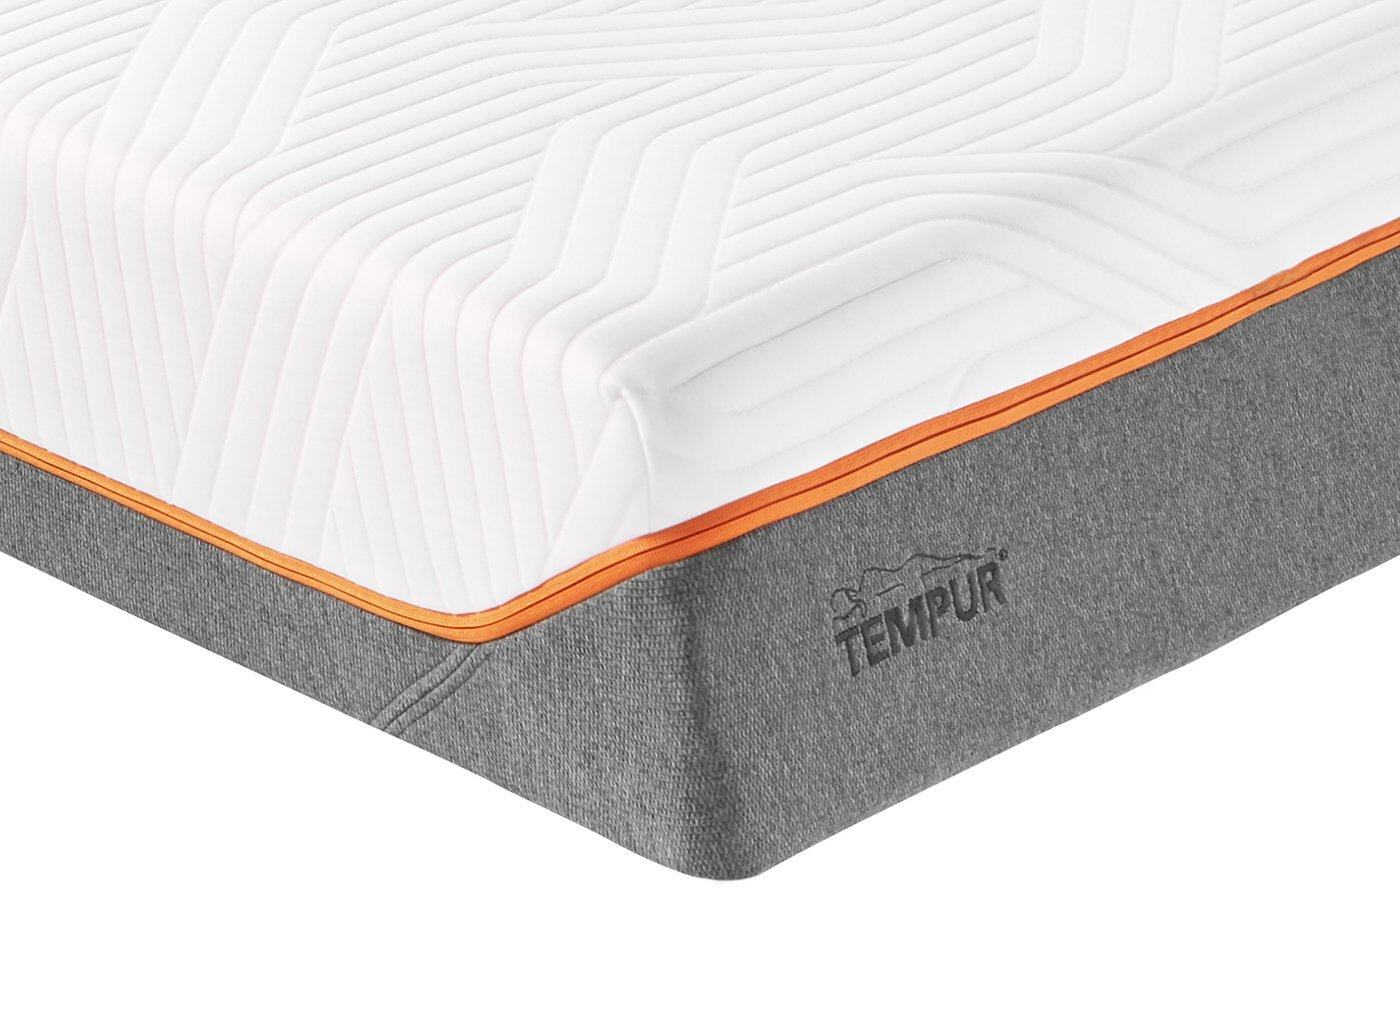 Tempur Cooltouch Original Elite Adjustable Mattress - Medium Firm 3'0 Single